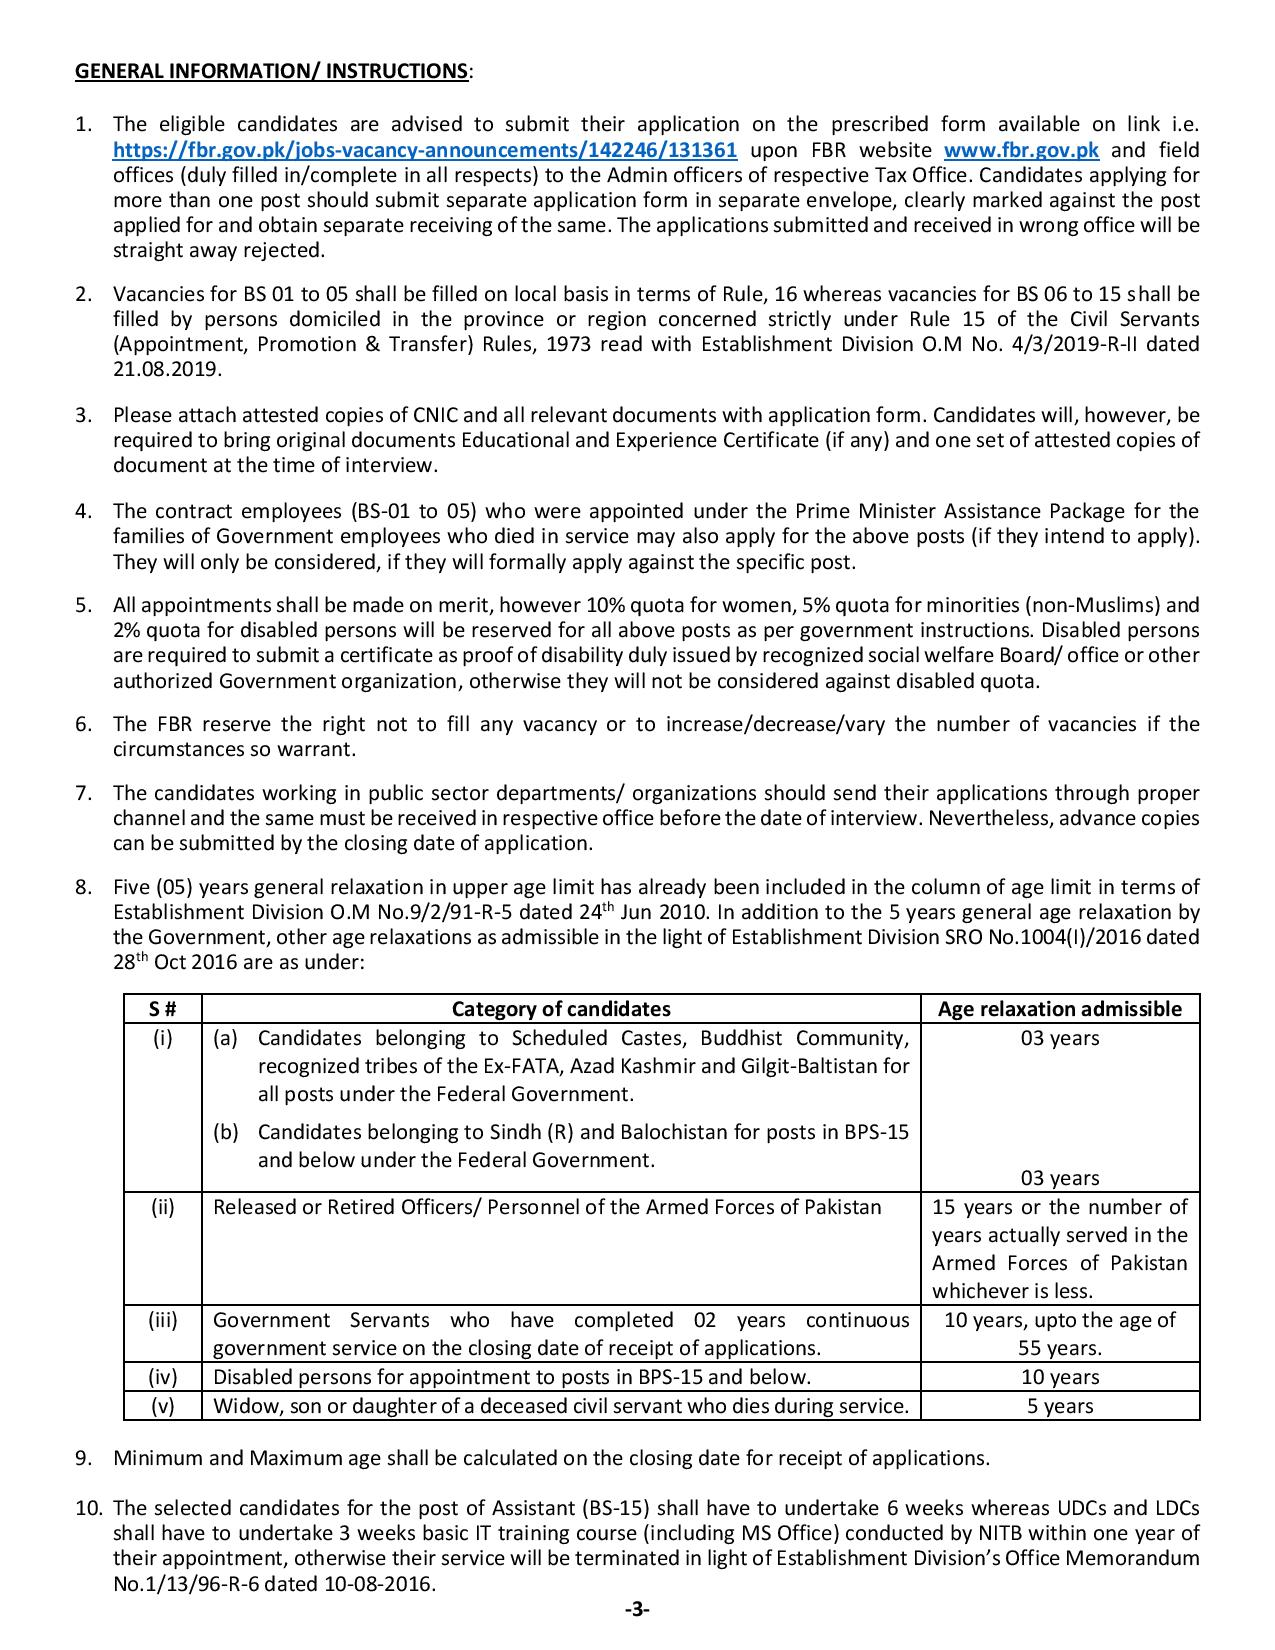 Federal Board of Revenue FBR Jobs 2021 – Download form